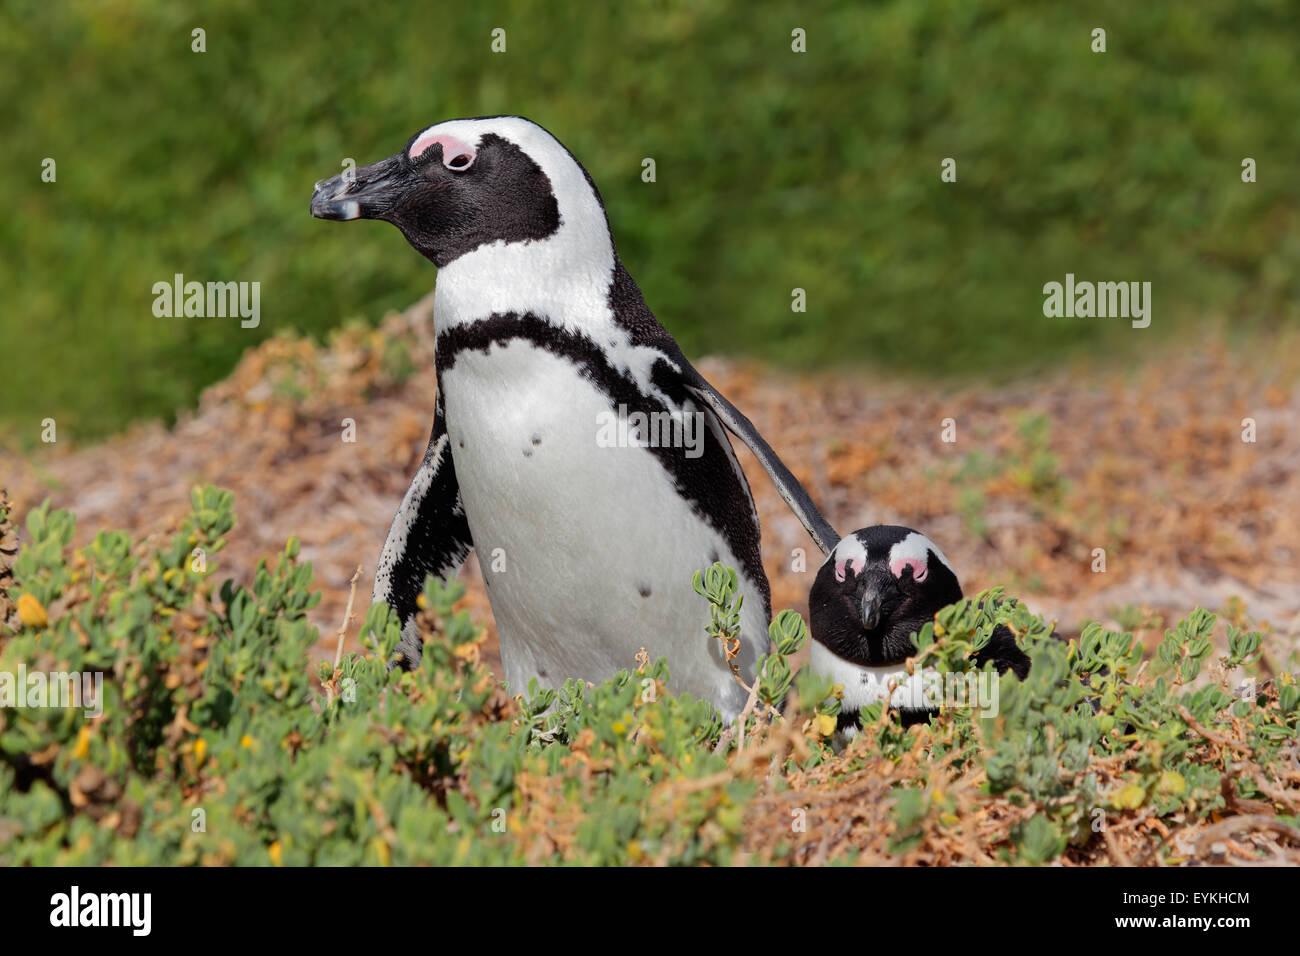 Breeding pair of African penguins (Spheniscus demersus), Western Cape, South Africa - Stock Image